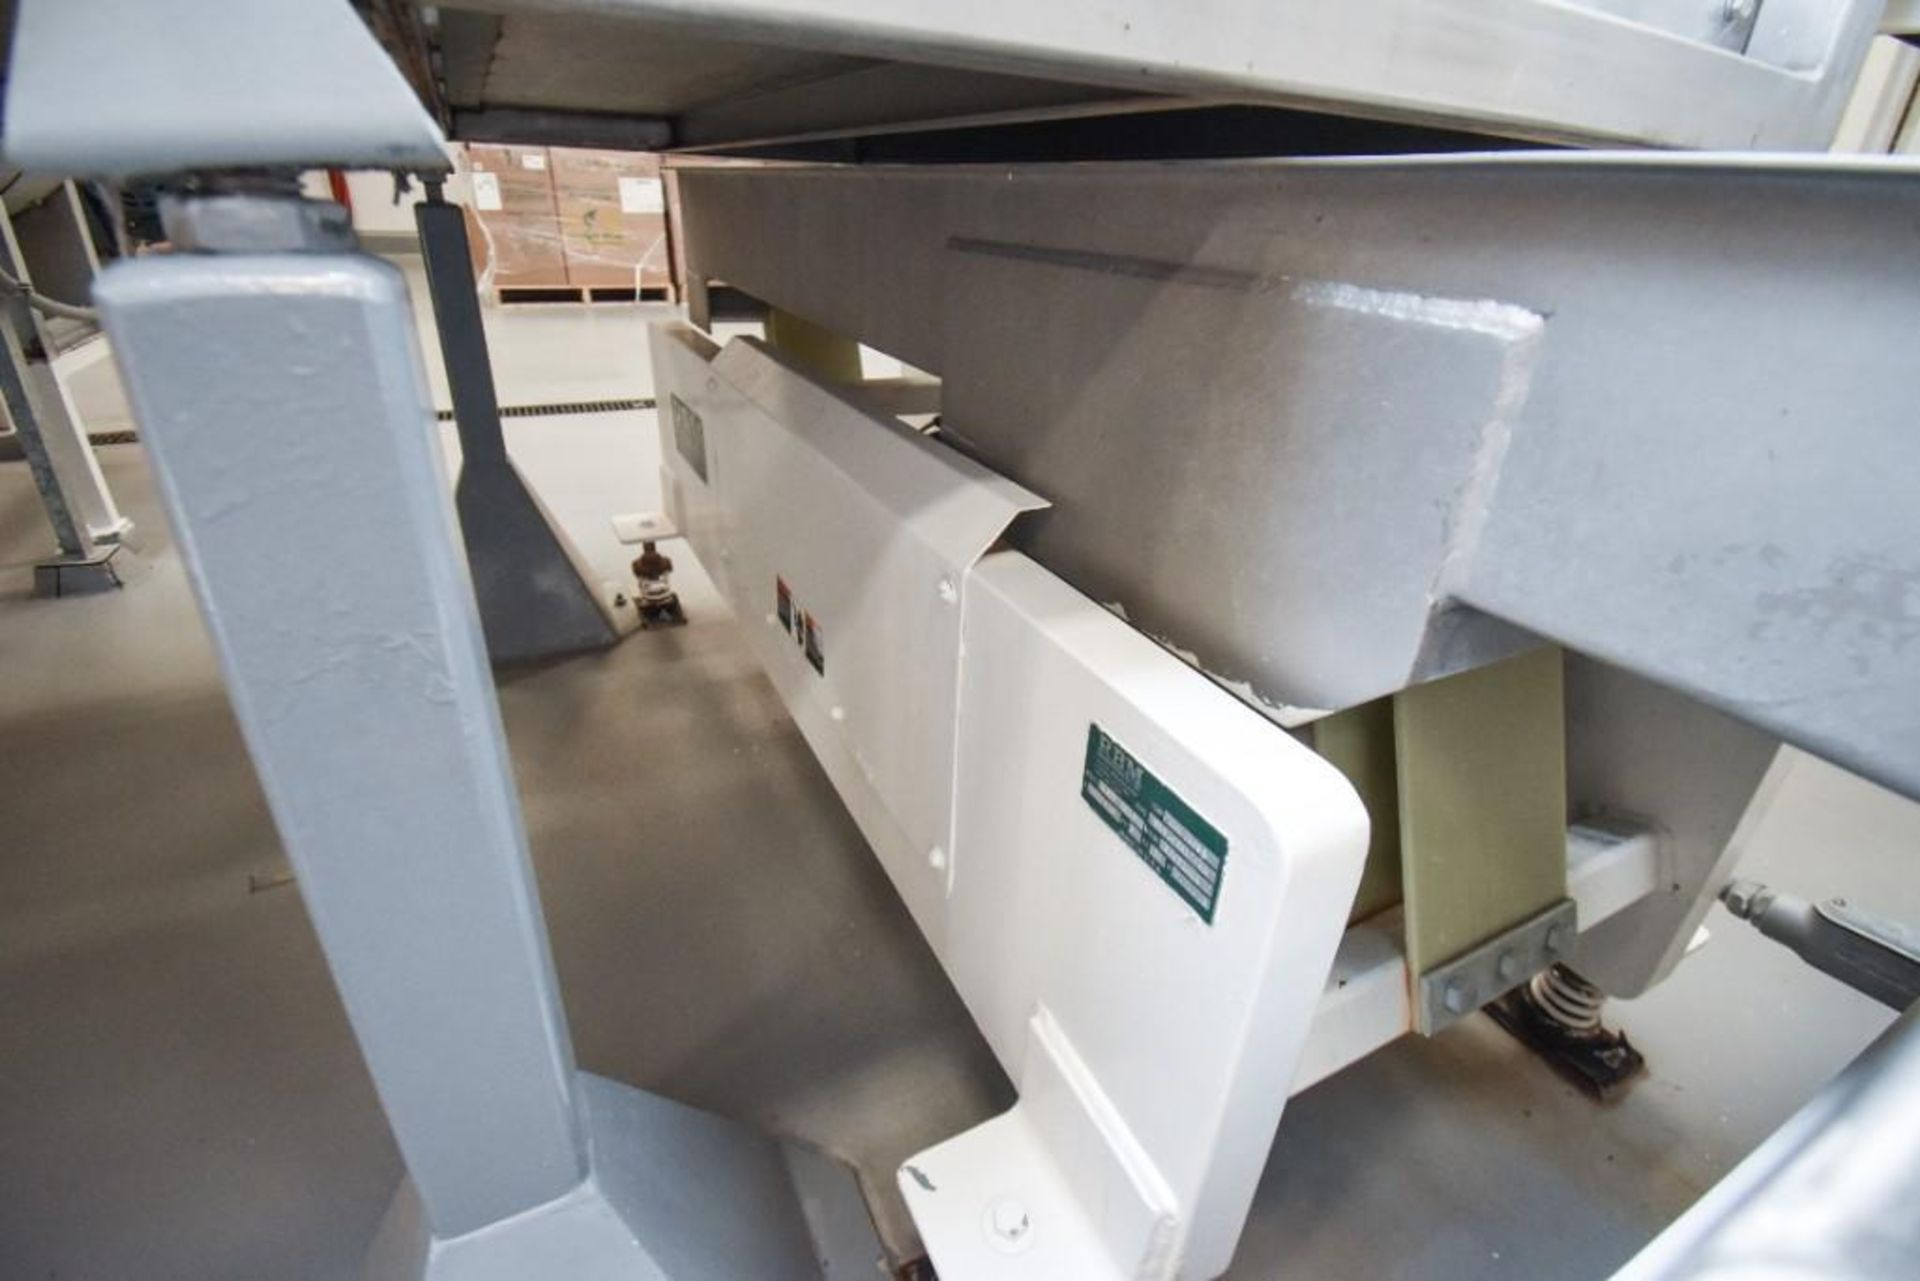 RBM Vibratory Deck VCNF-15X6X7 - Image 5 of 6